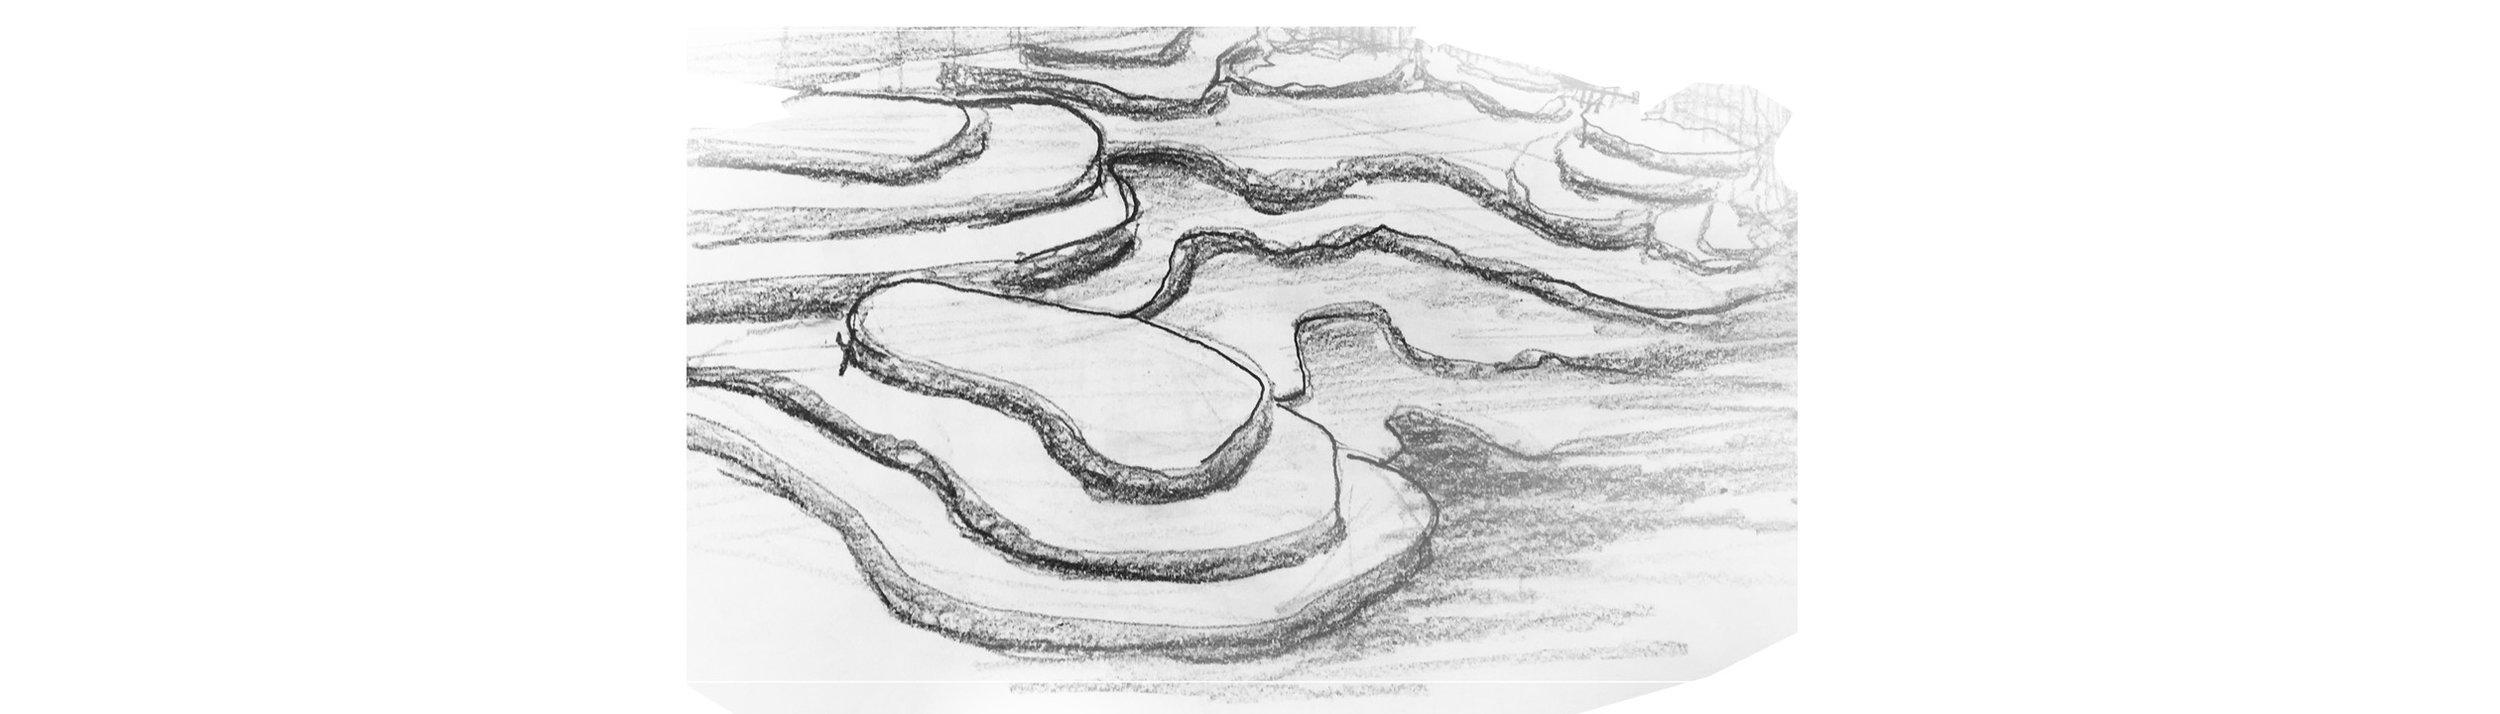 frick sketch.jpg